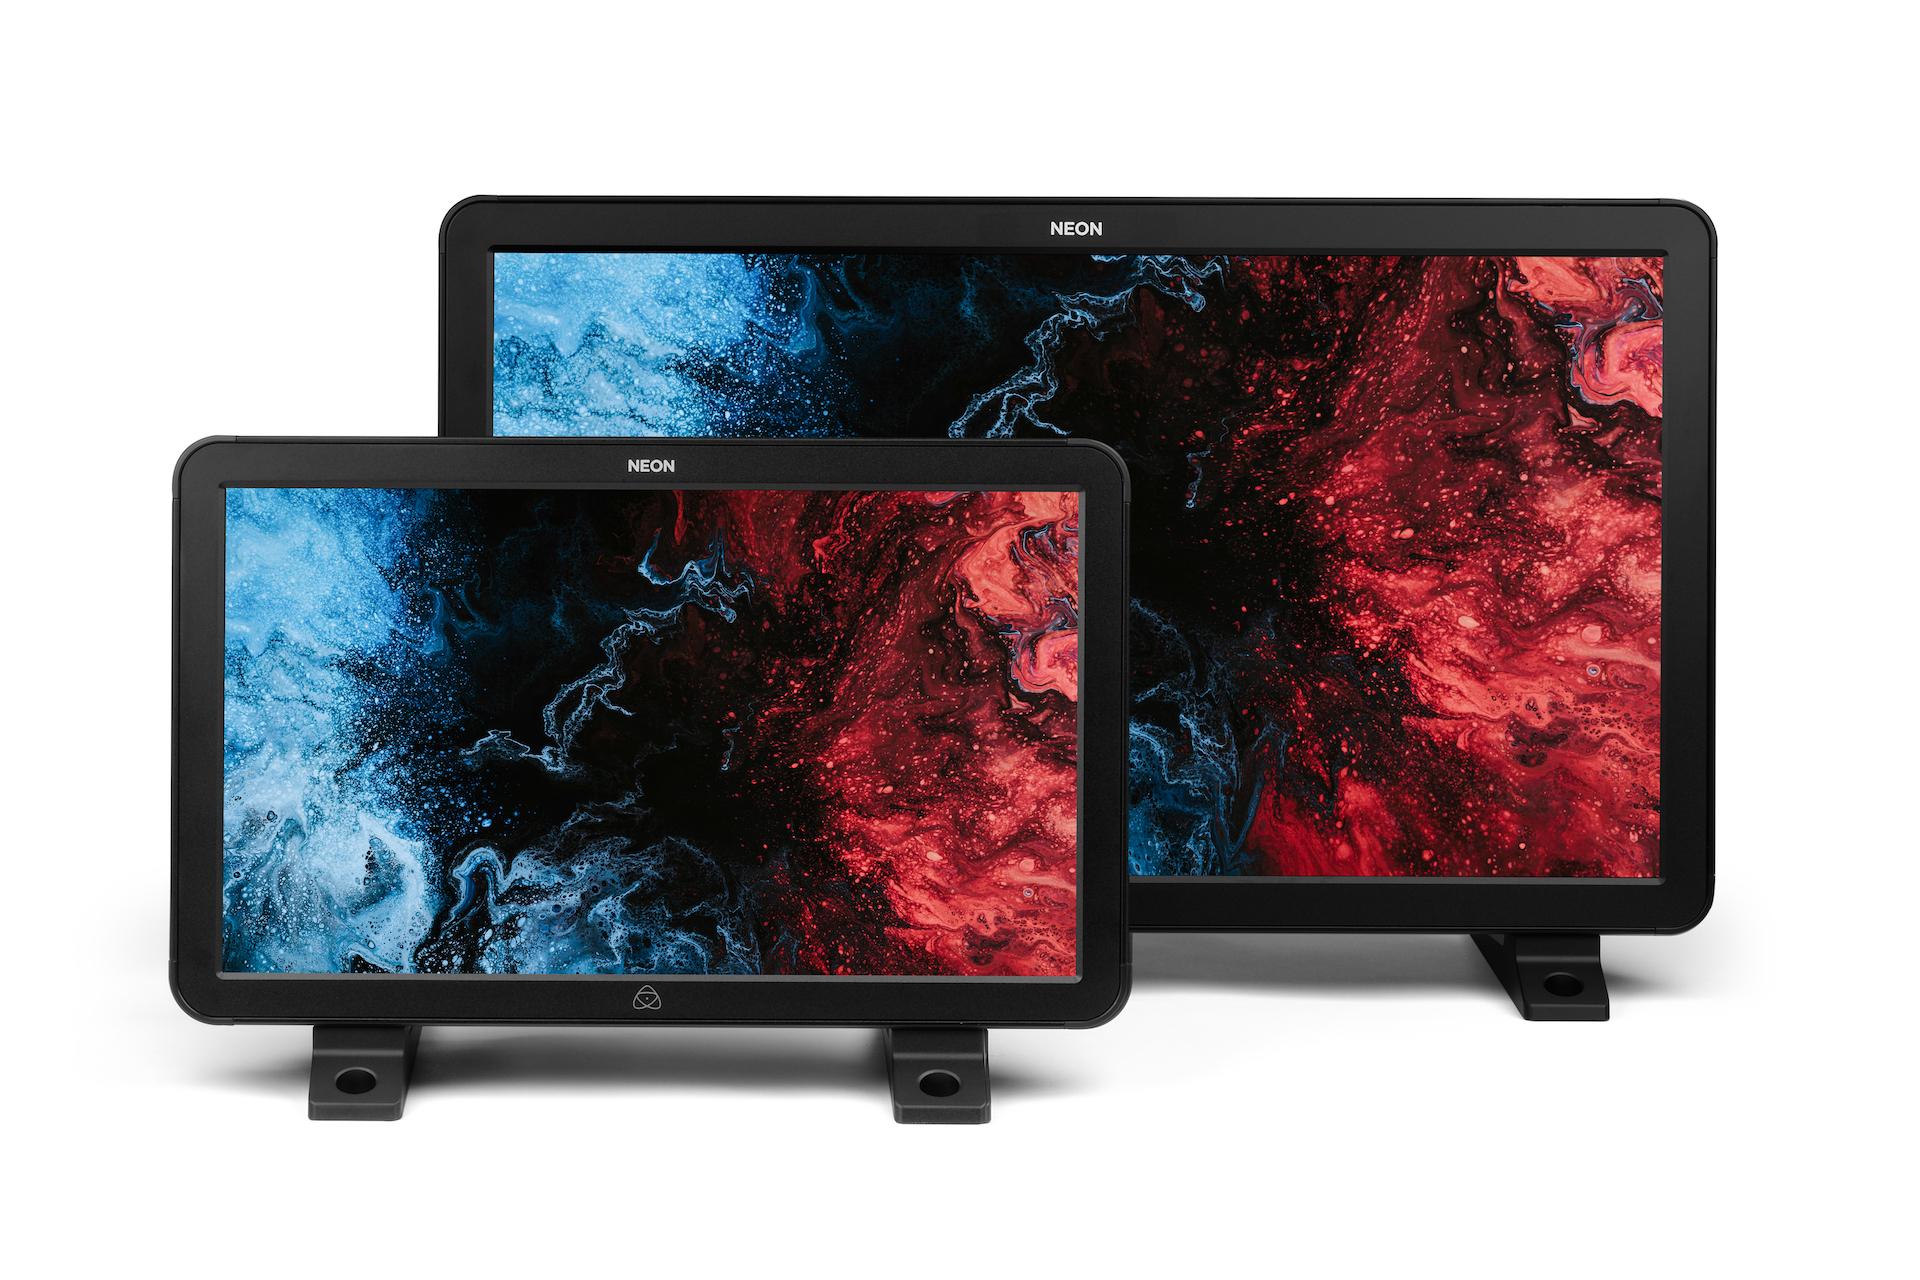 "Atomos NEON 17"" and 24"" monitors side-by-side. Image: Atomos."